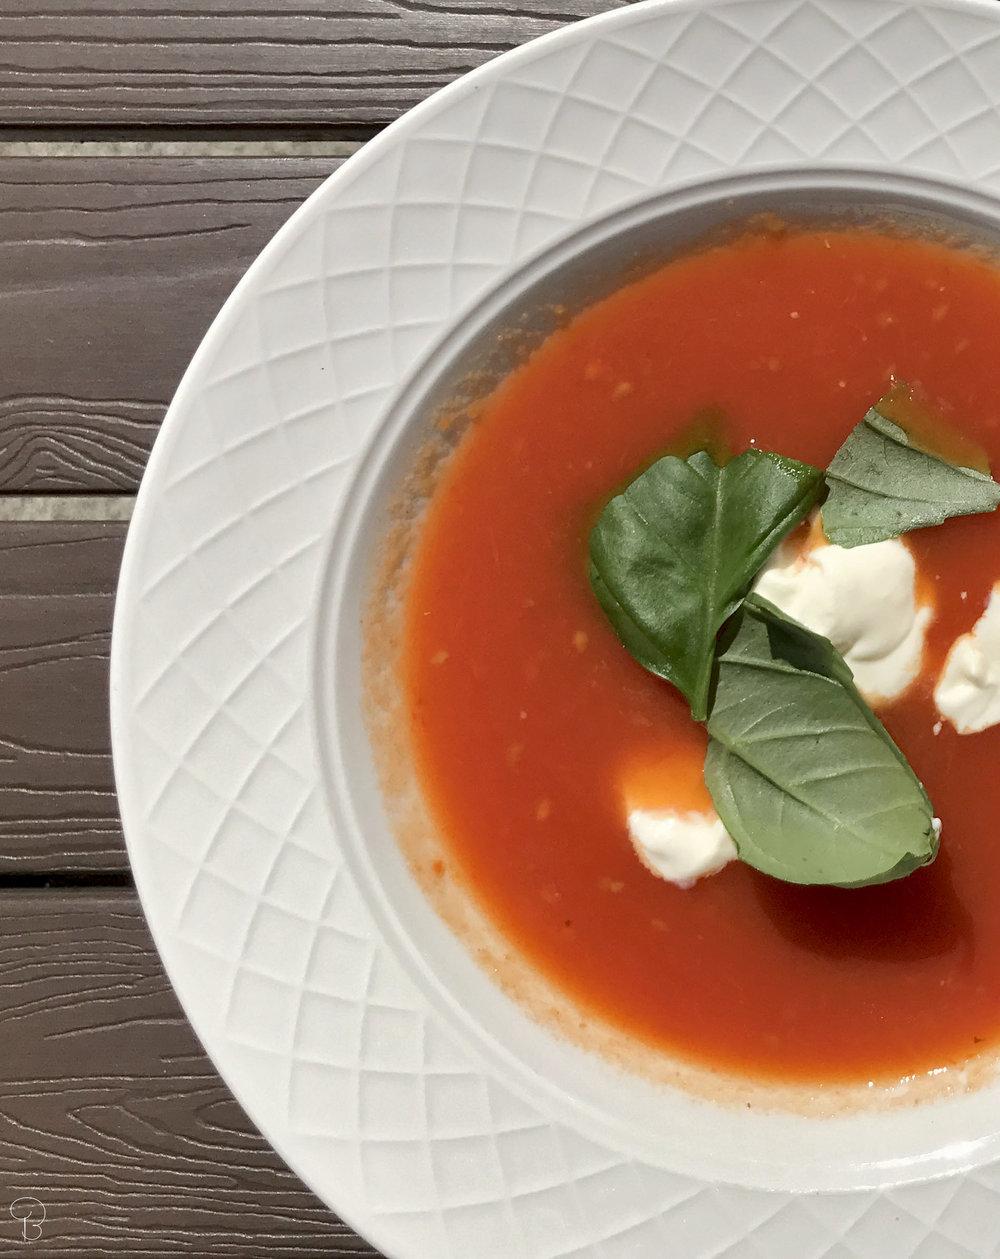 friðheimar-fridheimar-local-tomato-soup-green-iceland